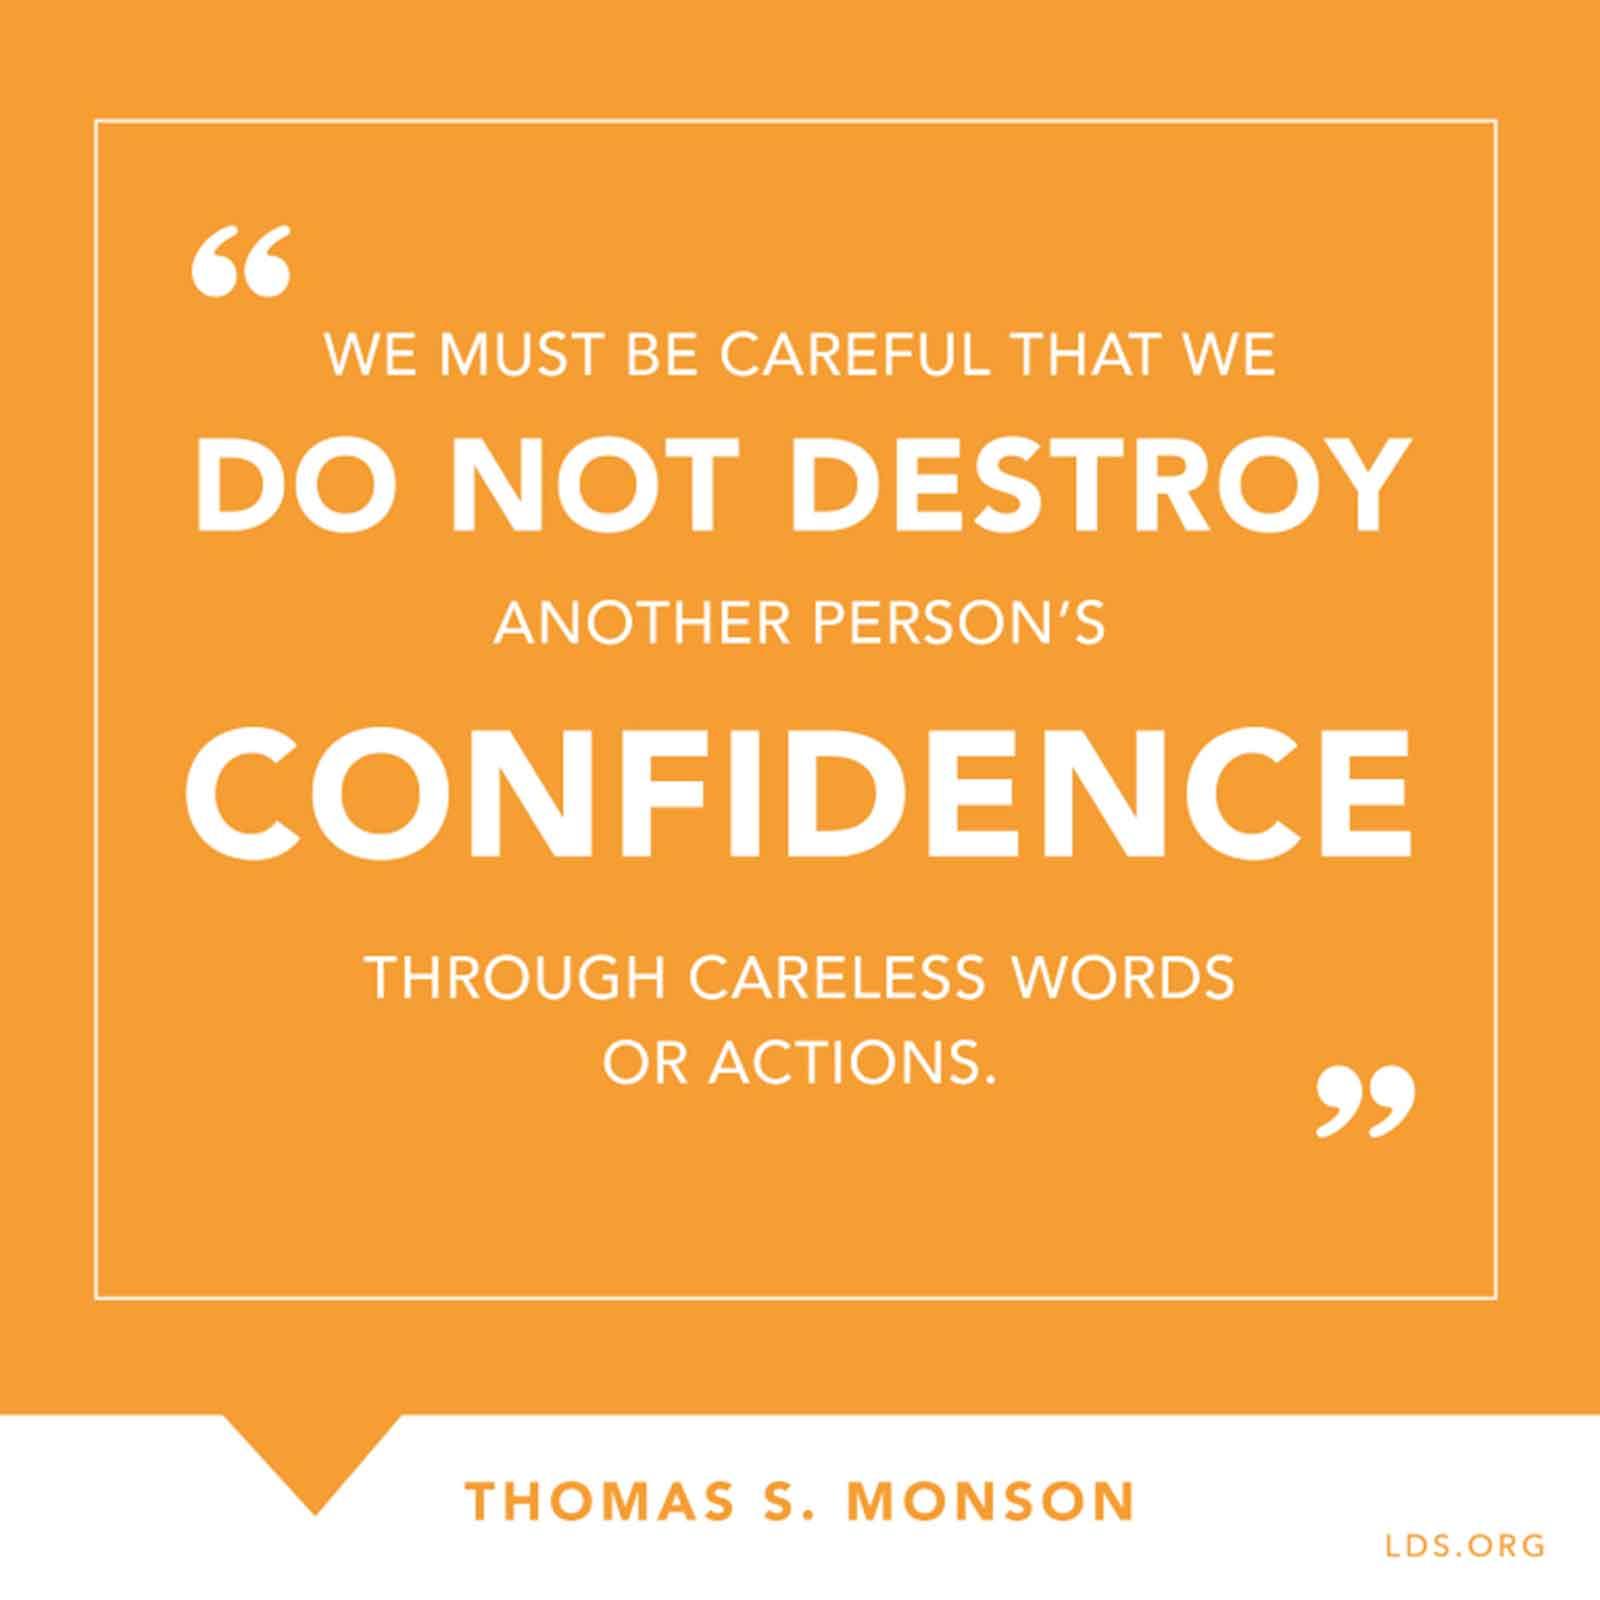 meme-monson-confidence